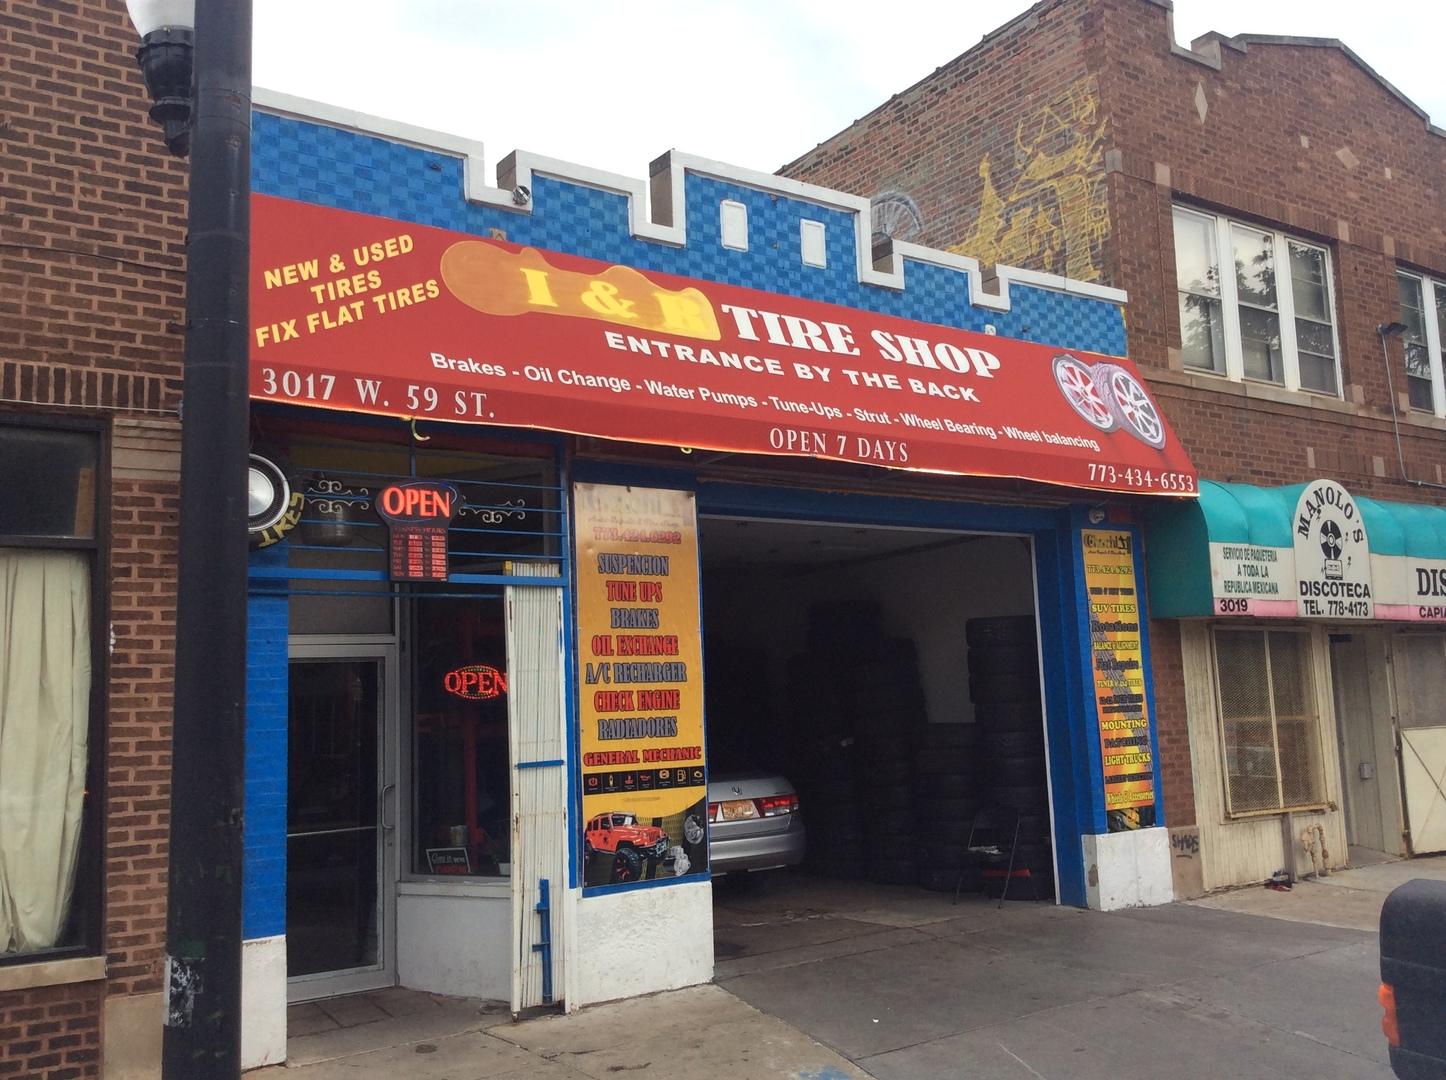 3017 W 59TH Street, Chicago, IL 60629